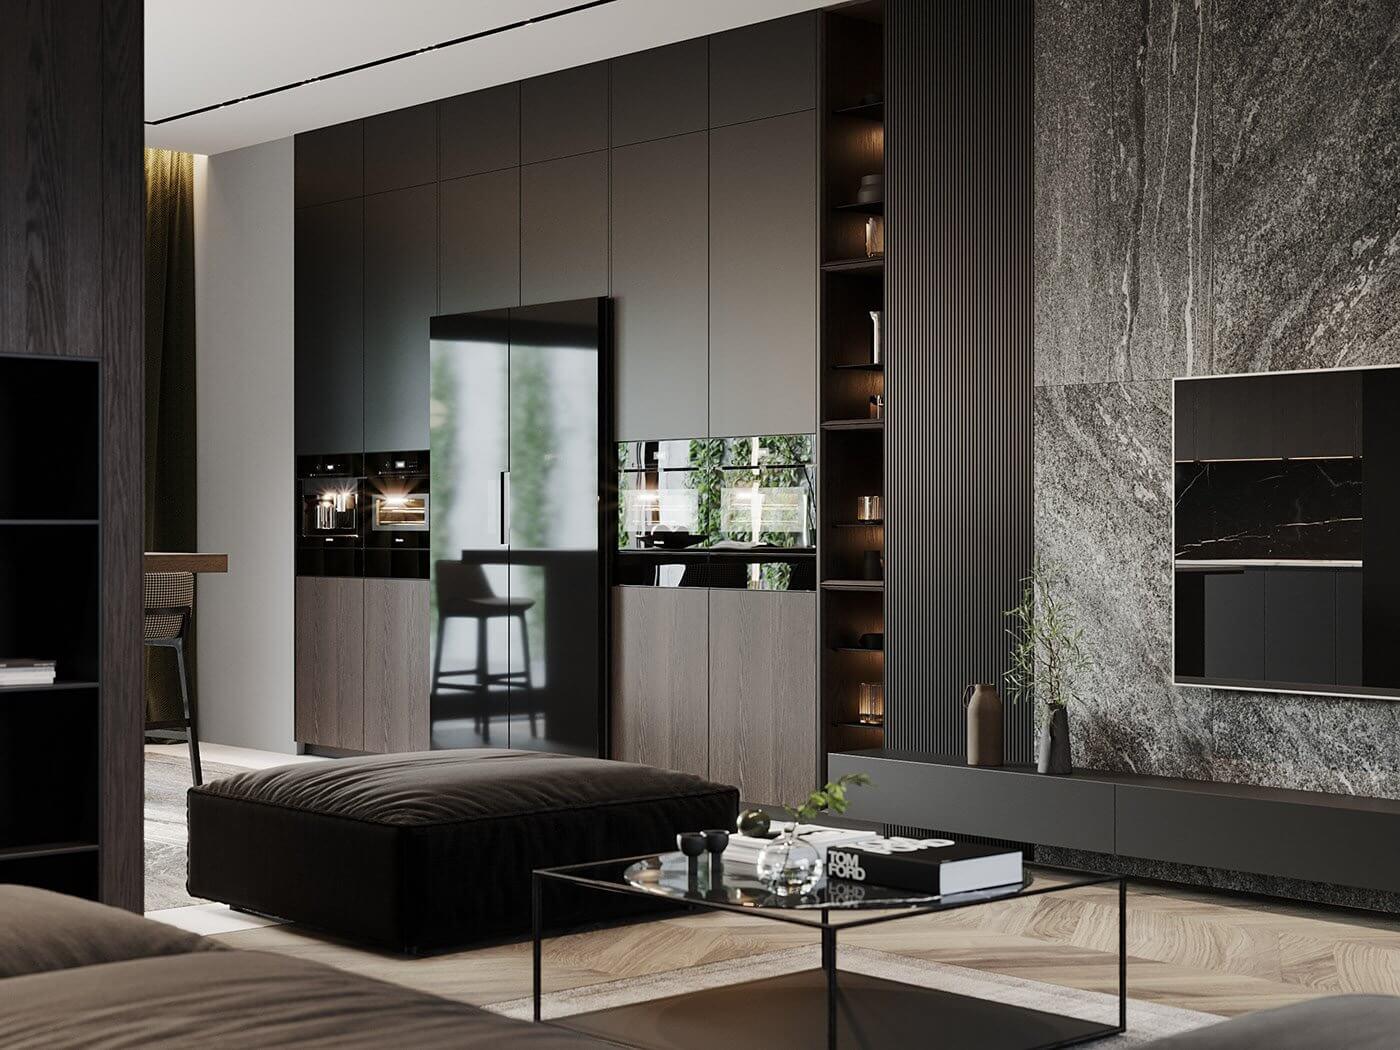 Dark living Apartment living room design tv wall - cgi visualization